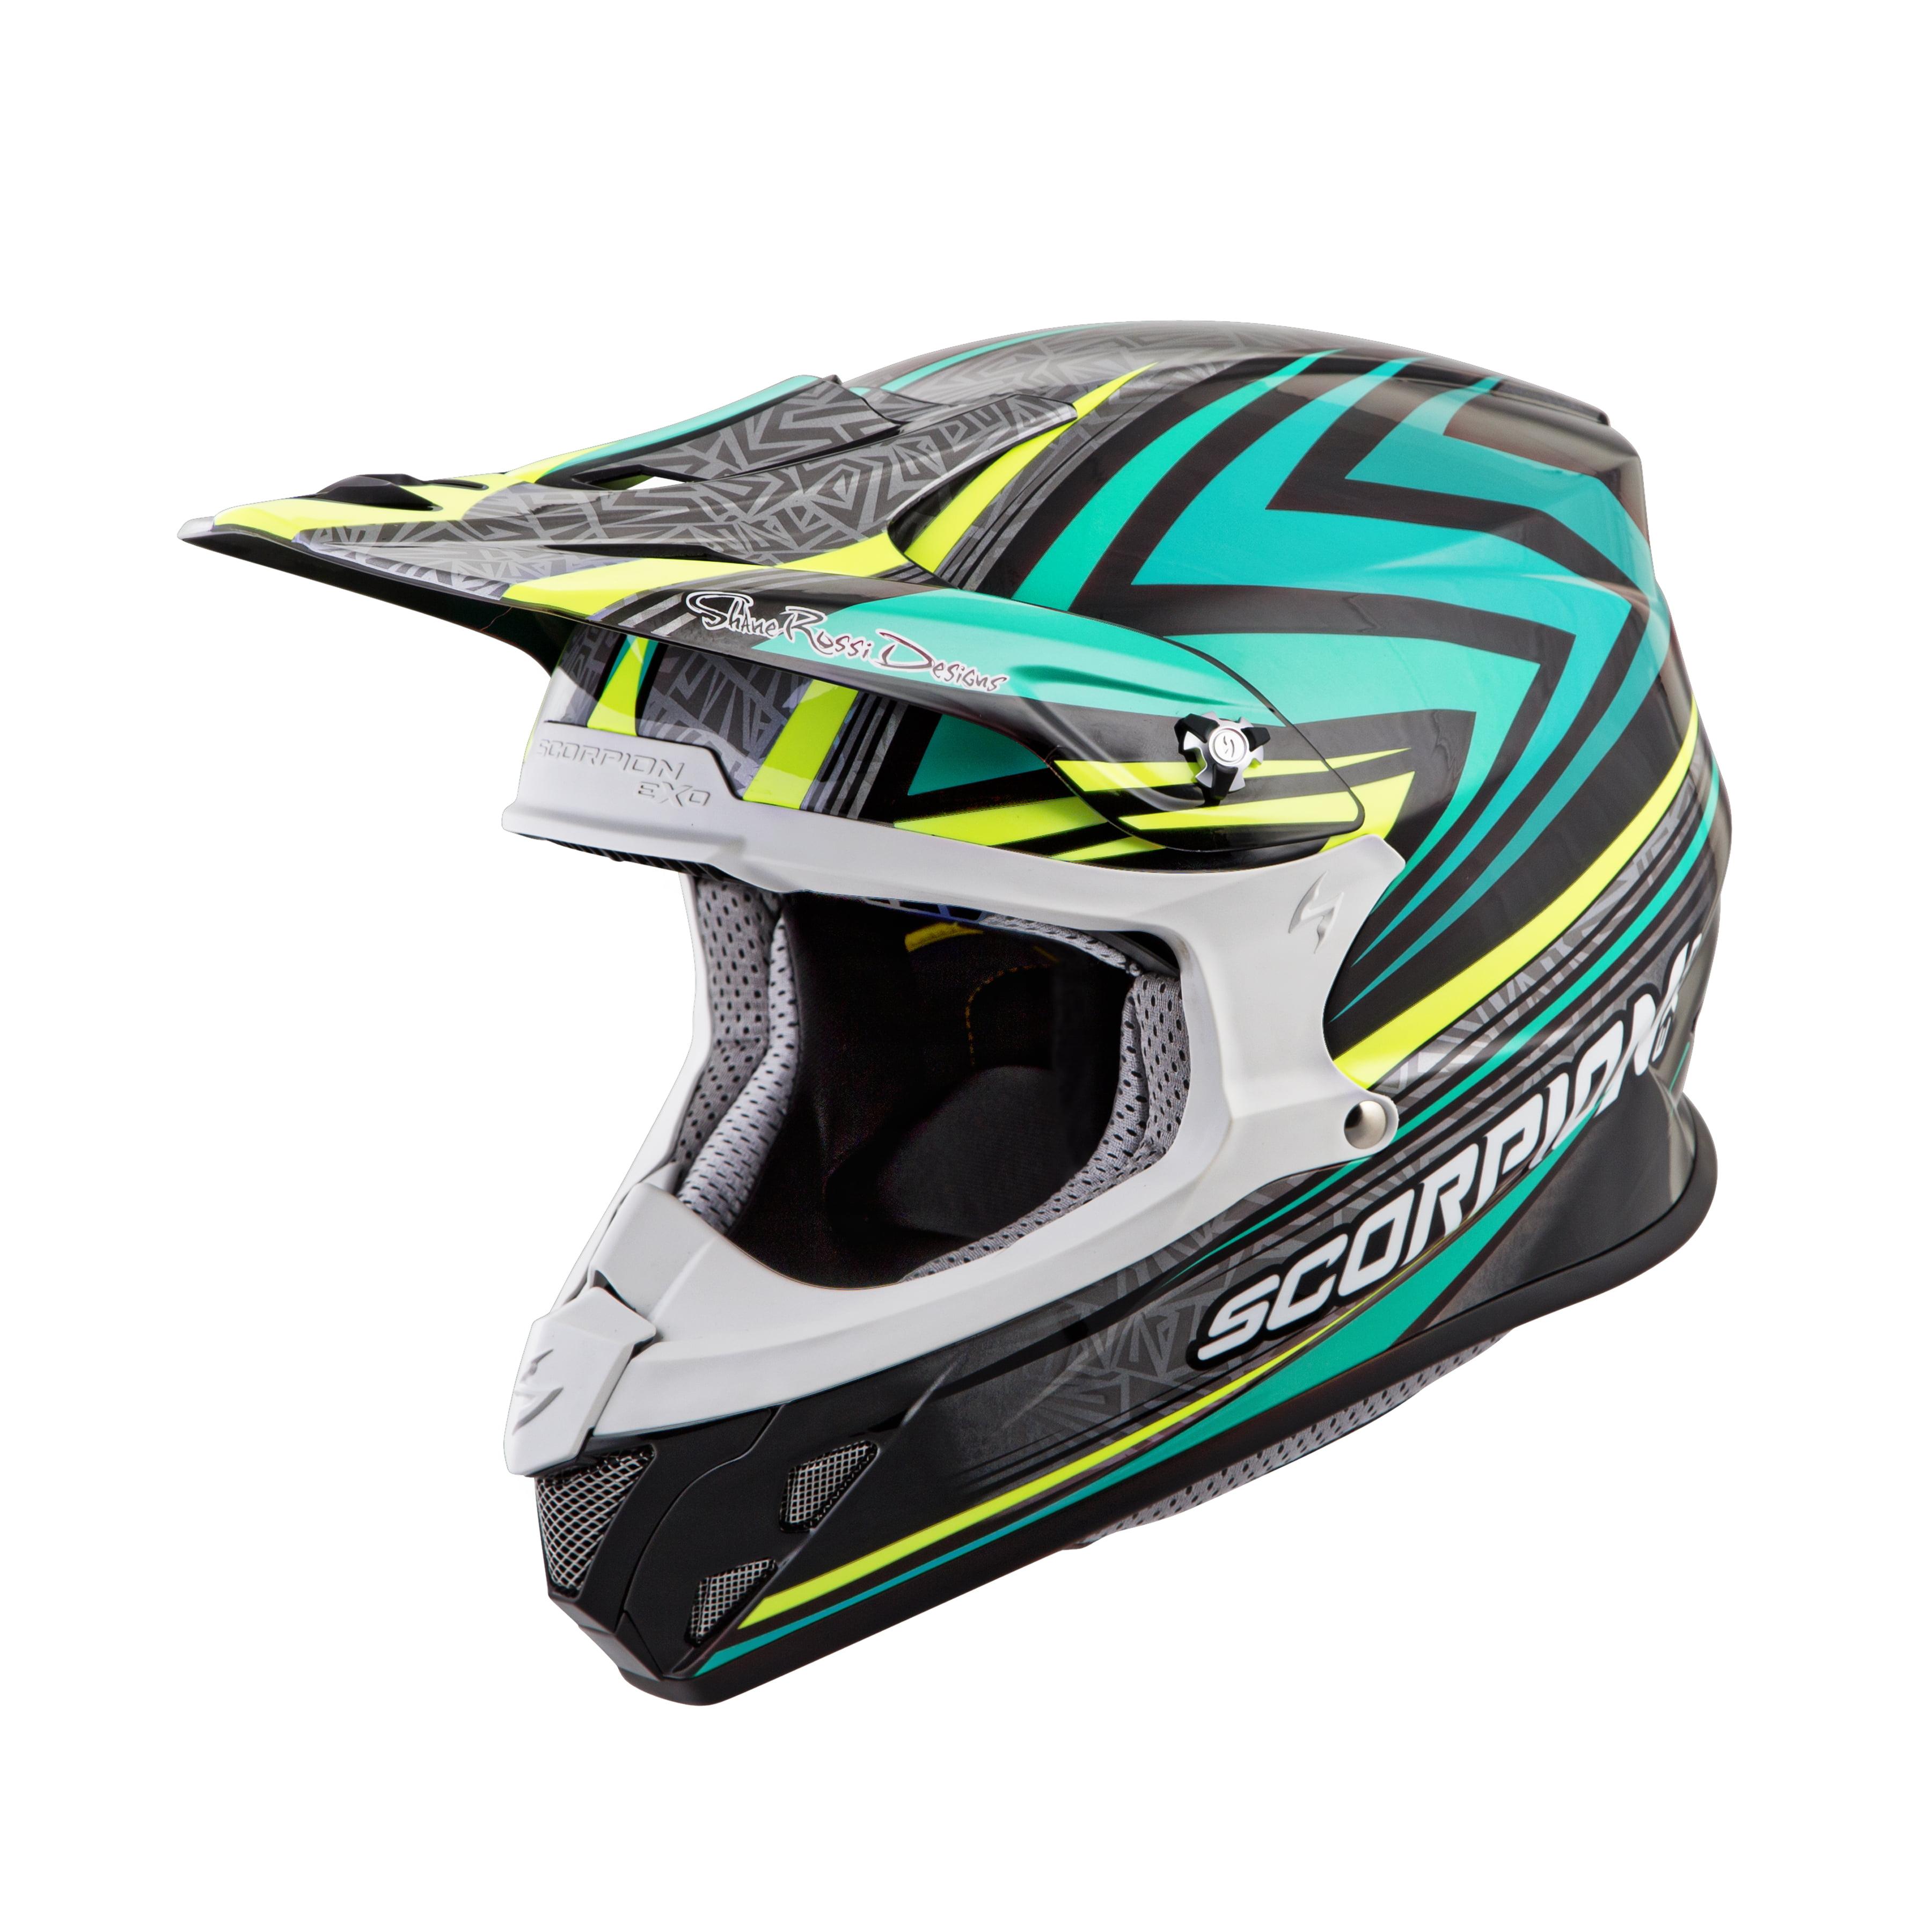 Scorpion VX-R70 Motocross ATV UTV Dirtbike Offroad Helmet